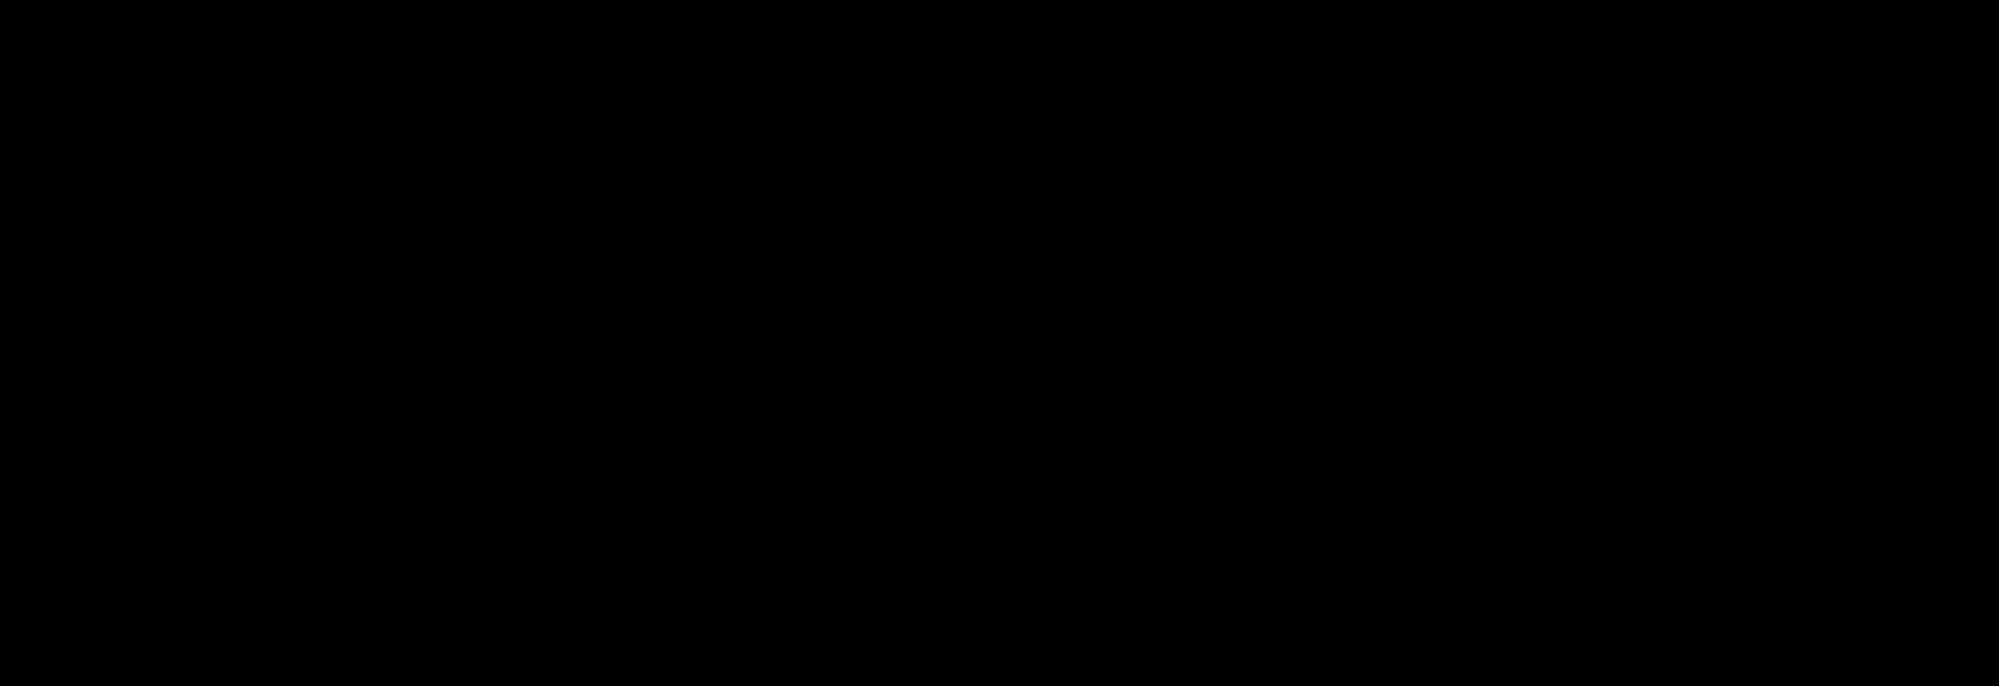 Turigono